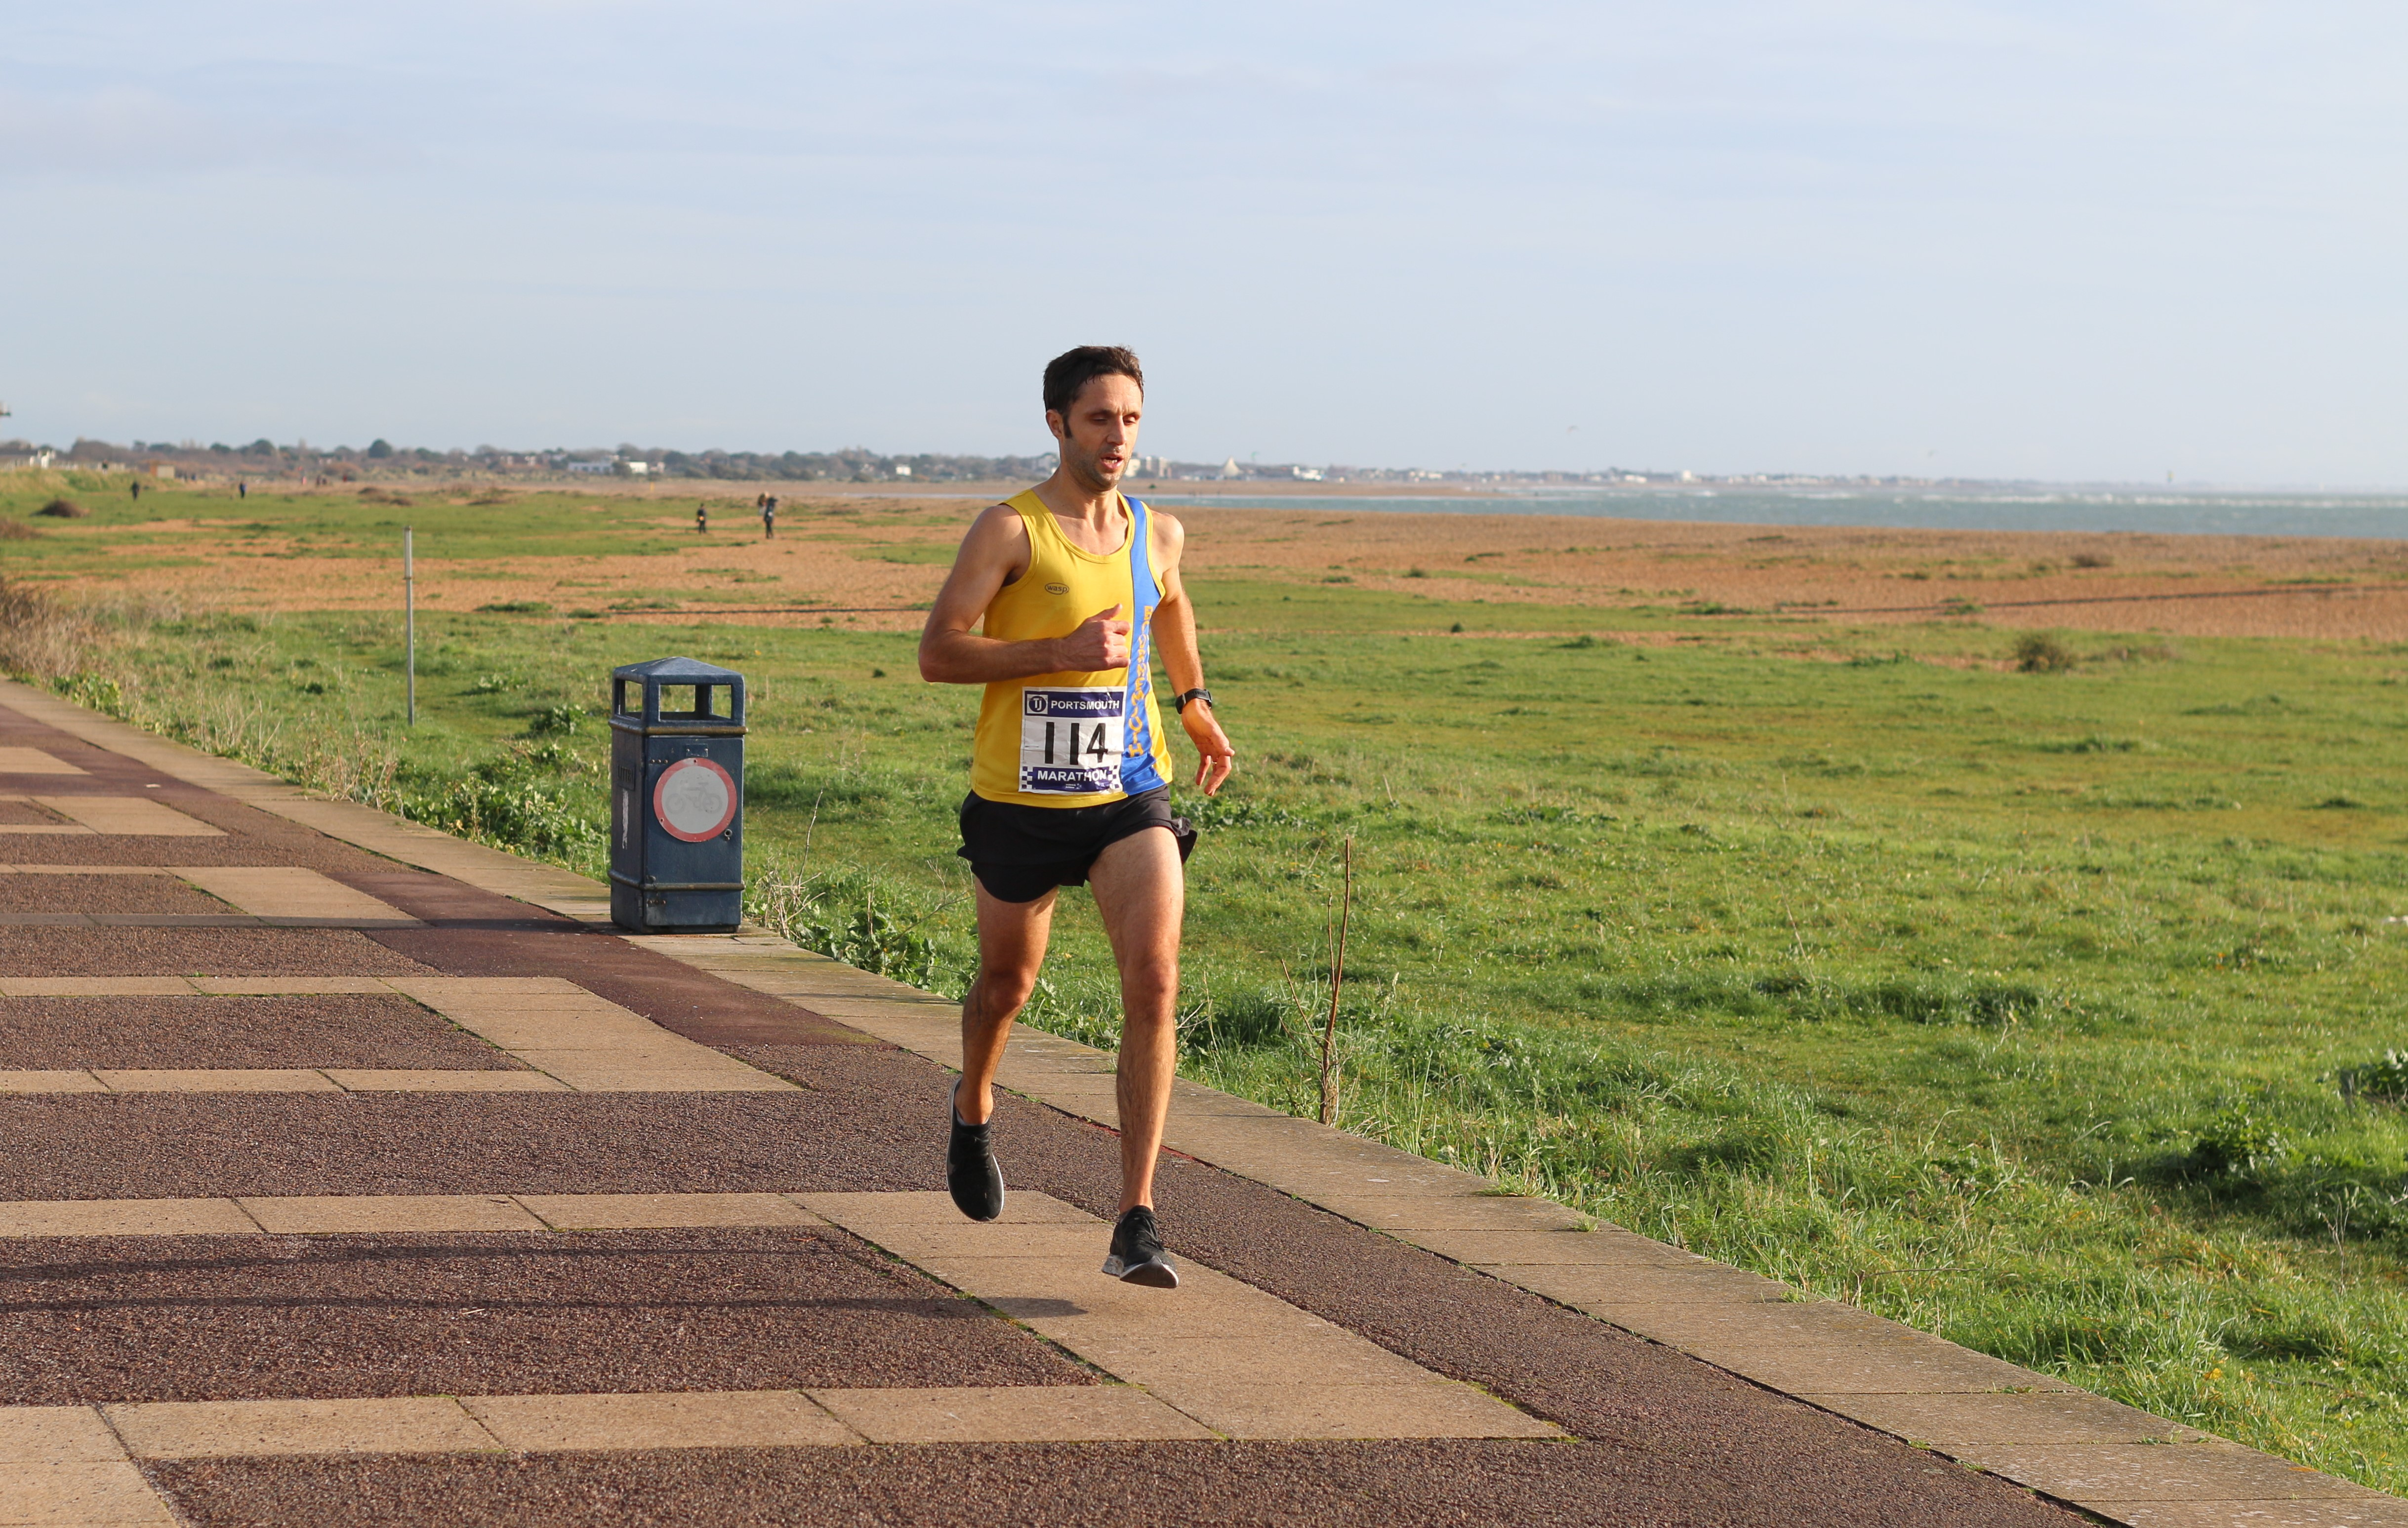 Jez Bragg moves forward in the Portsmouth Coastal Marathon